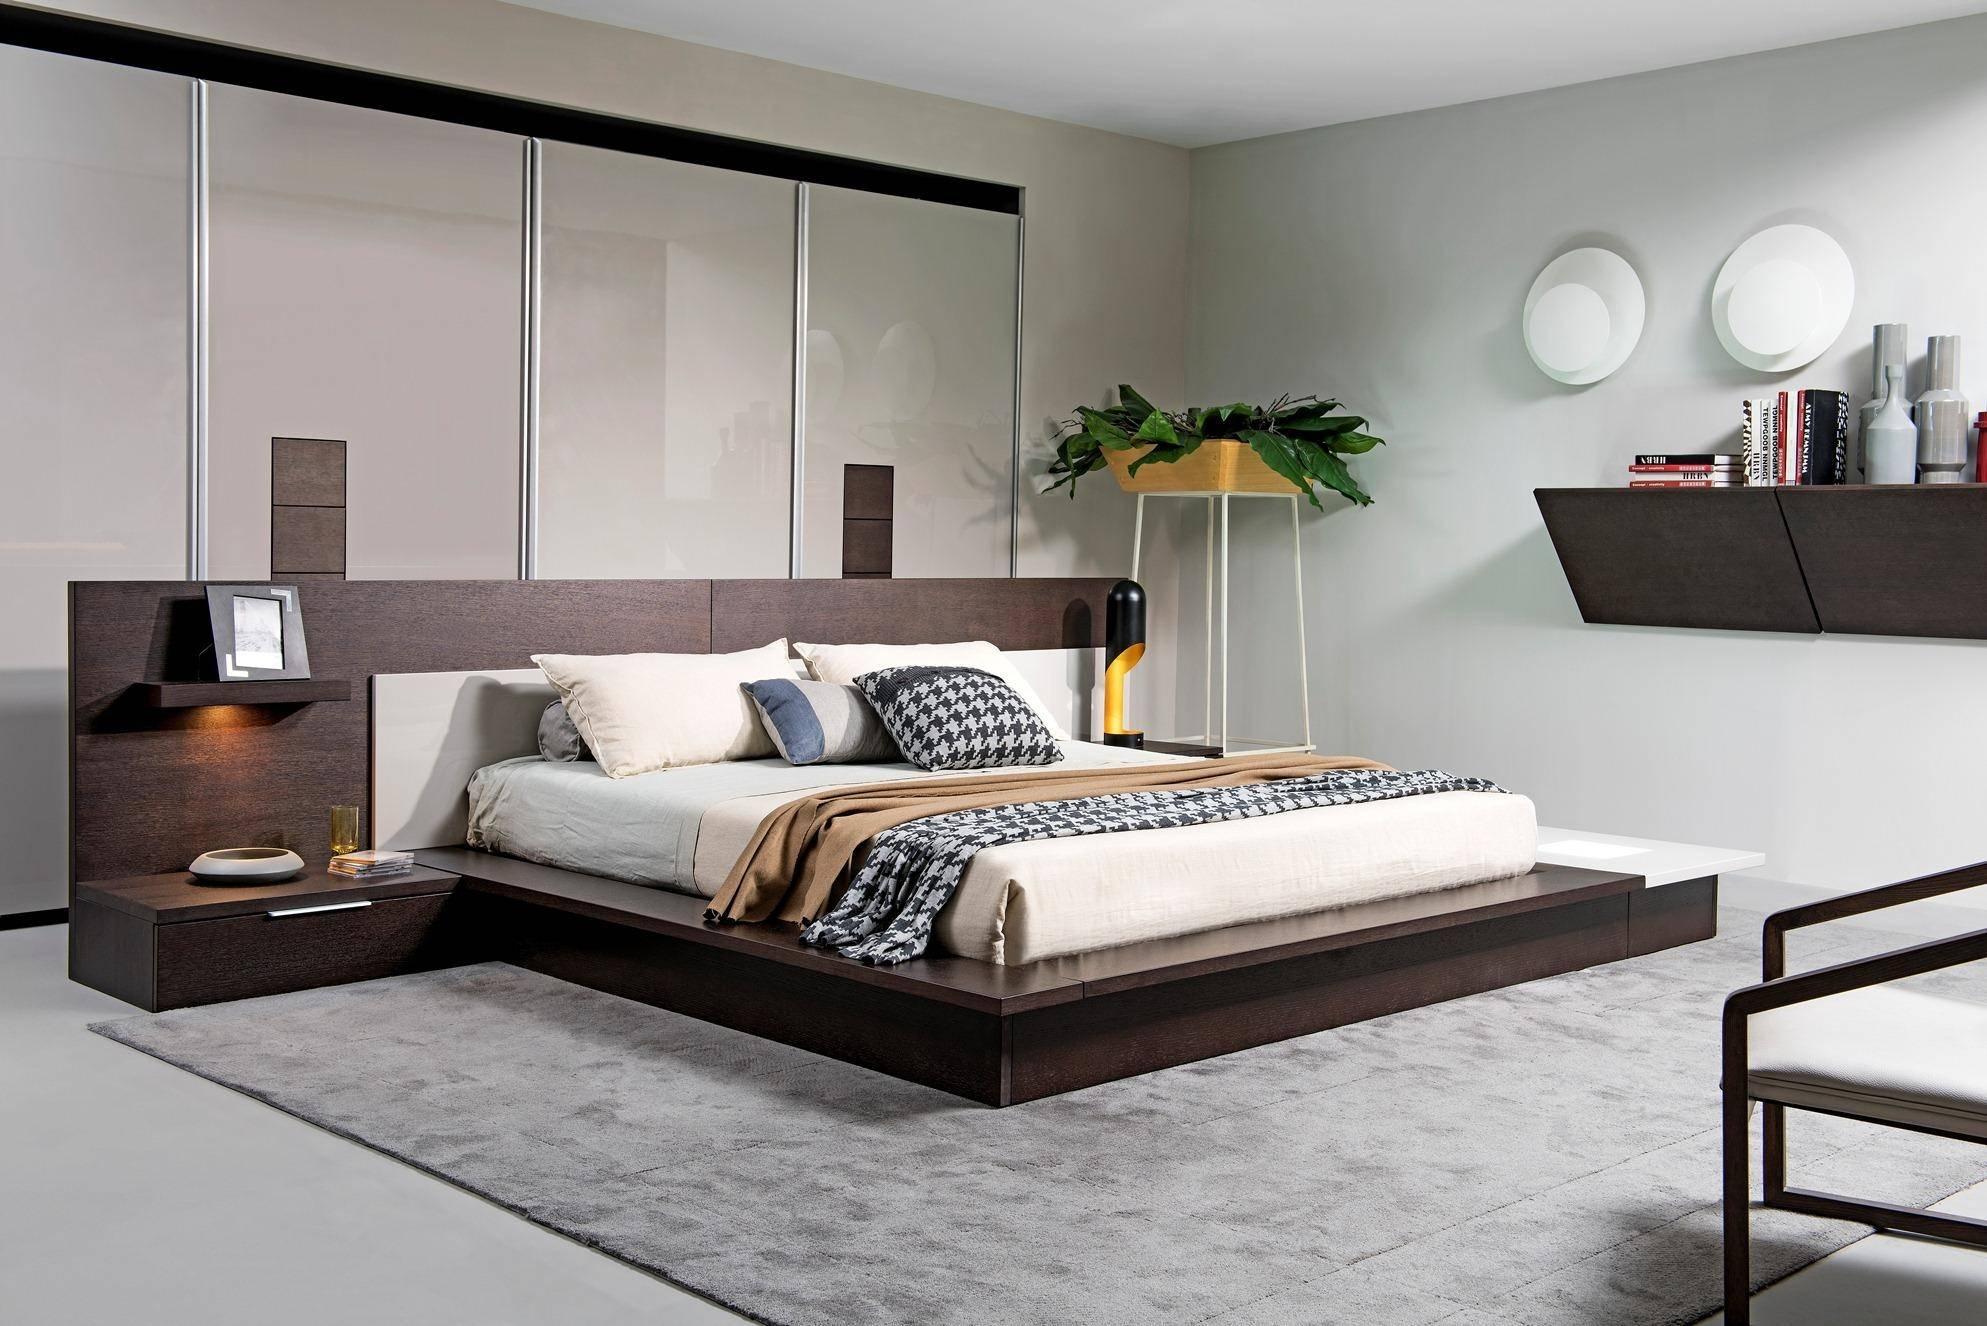 Buy Soflex Rochester King Platform Bed In Brown Gray Wood Online